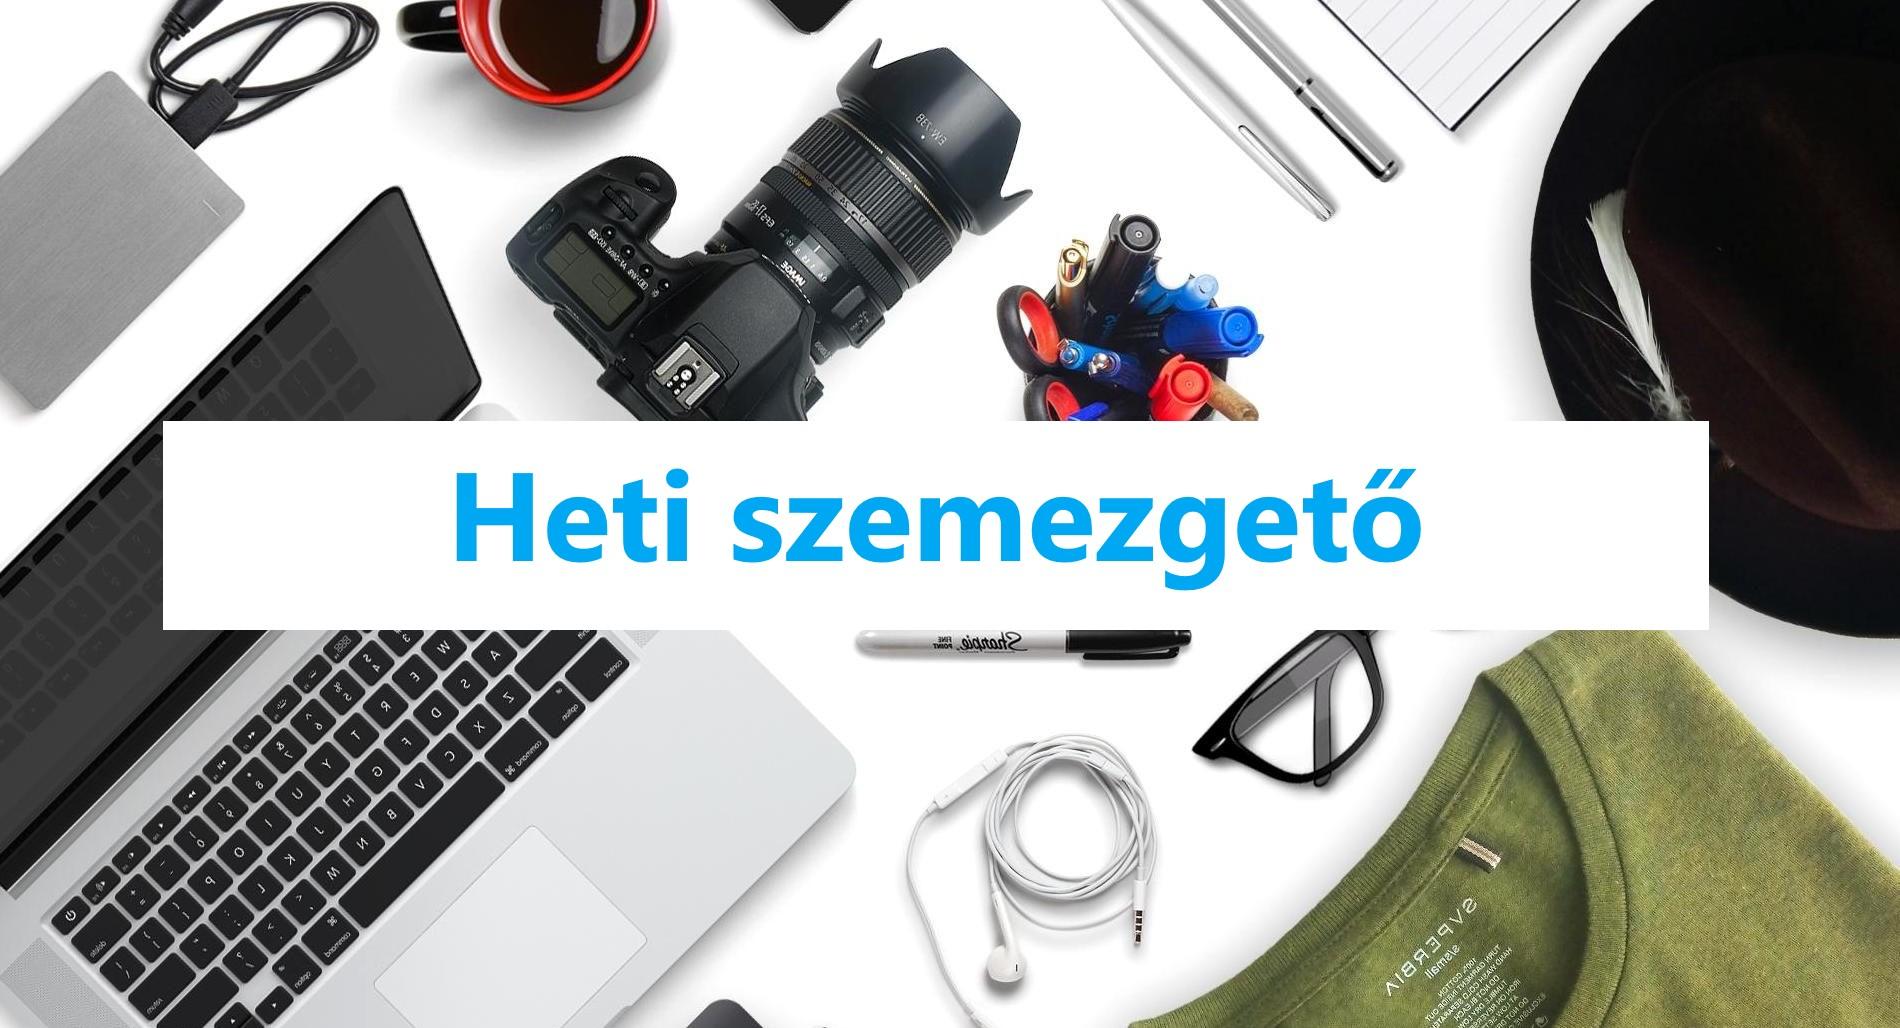 heti_szemezgeto_uj_4.jpg